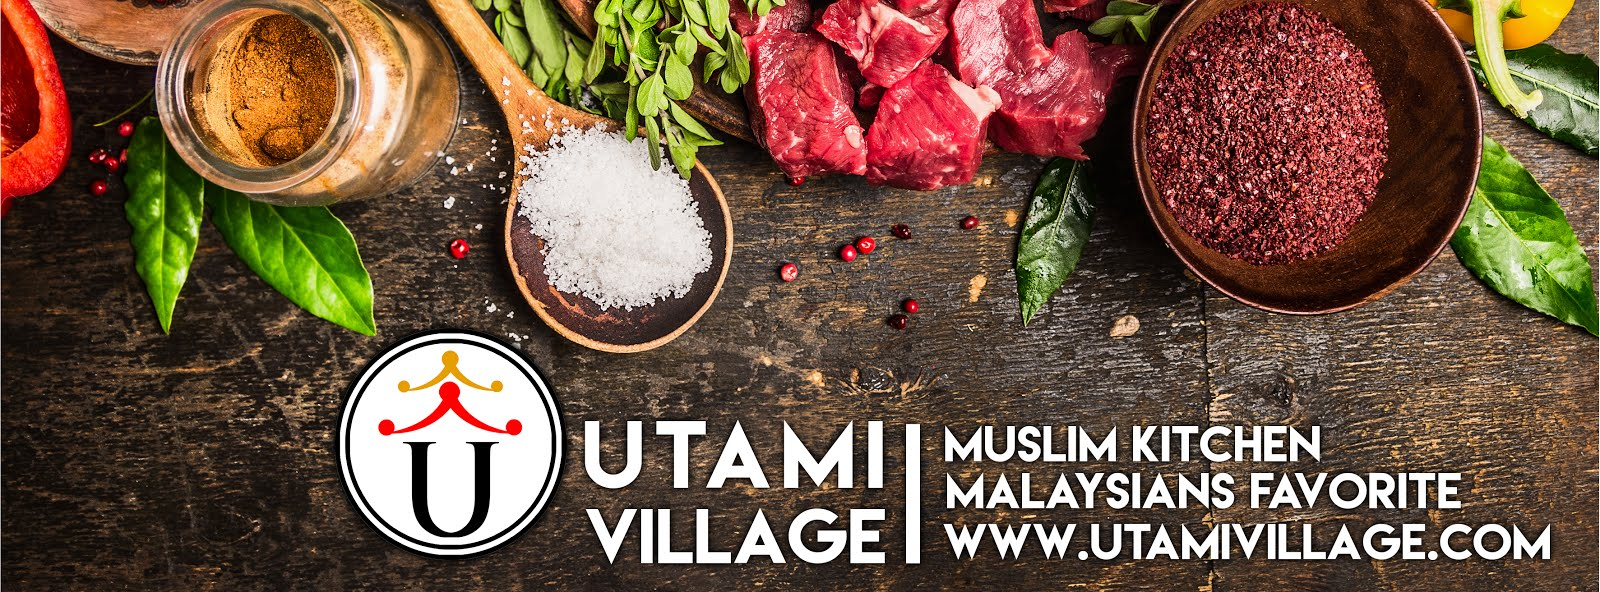 Utami Village